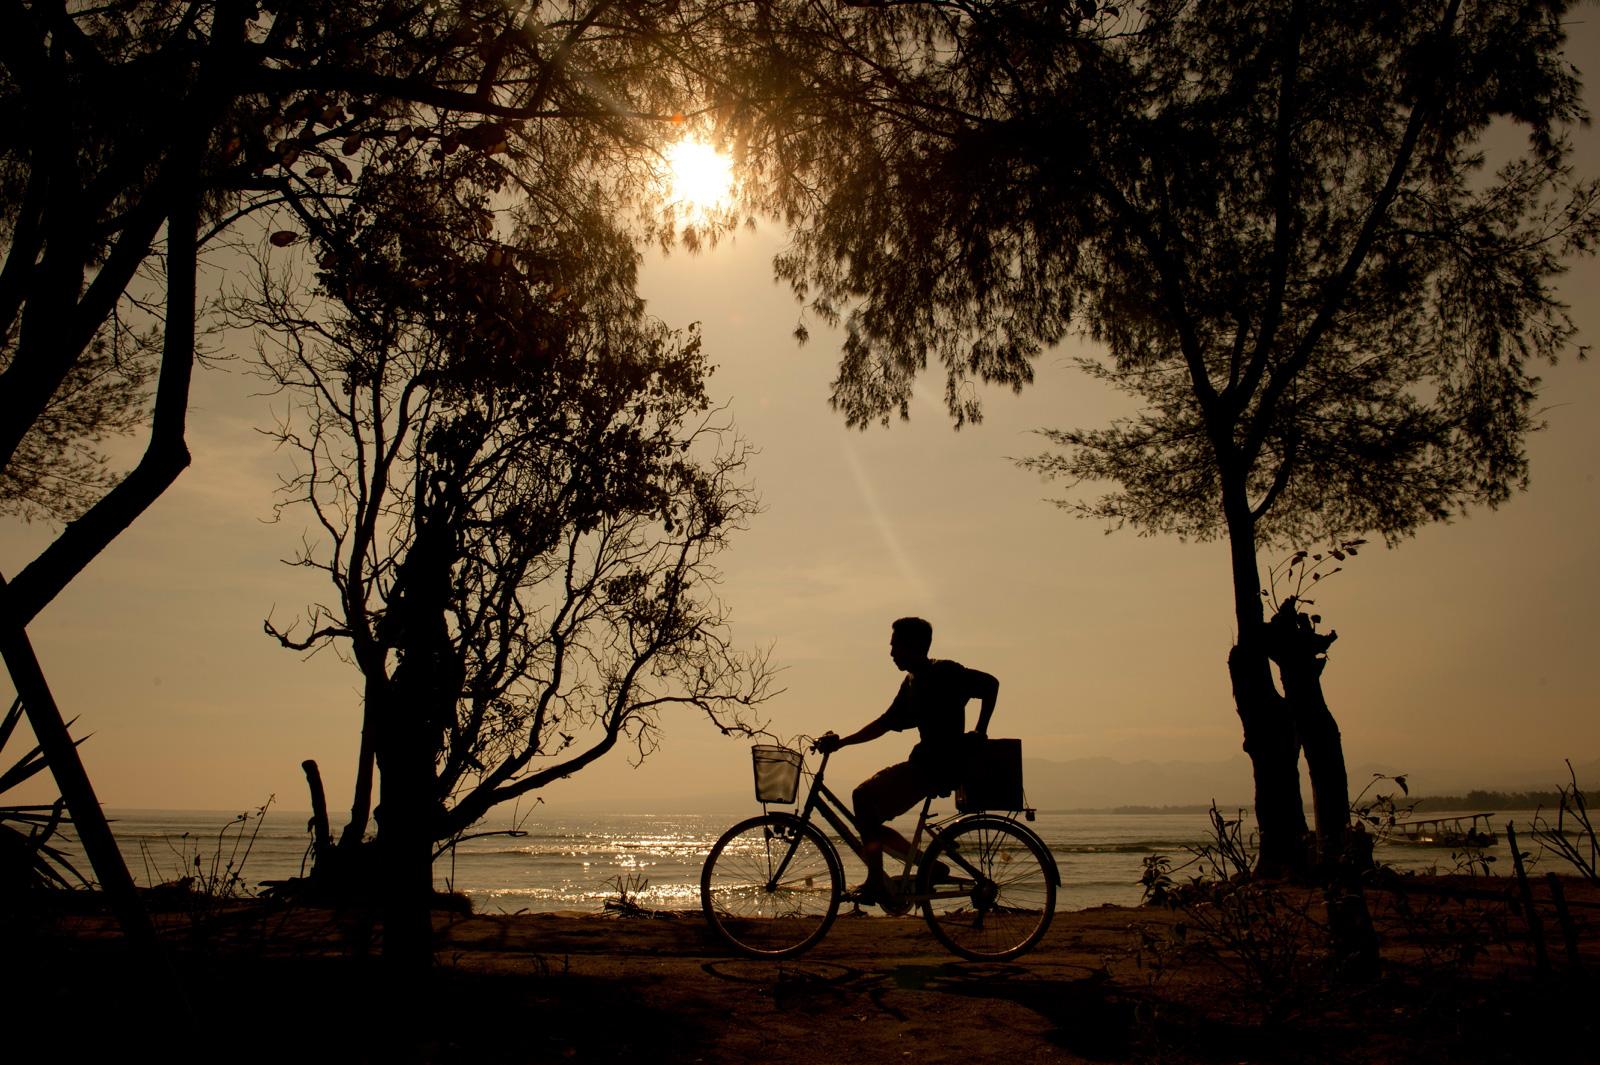 Gili-Islands-South-African-Travel-Photographer-Jacki-Bruniquel-012